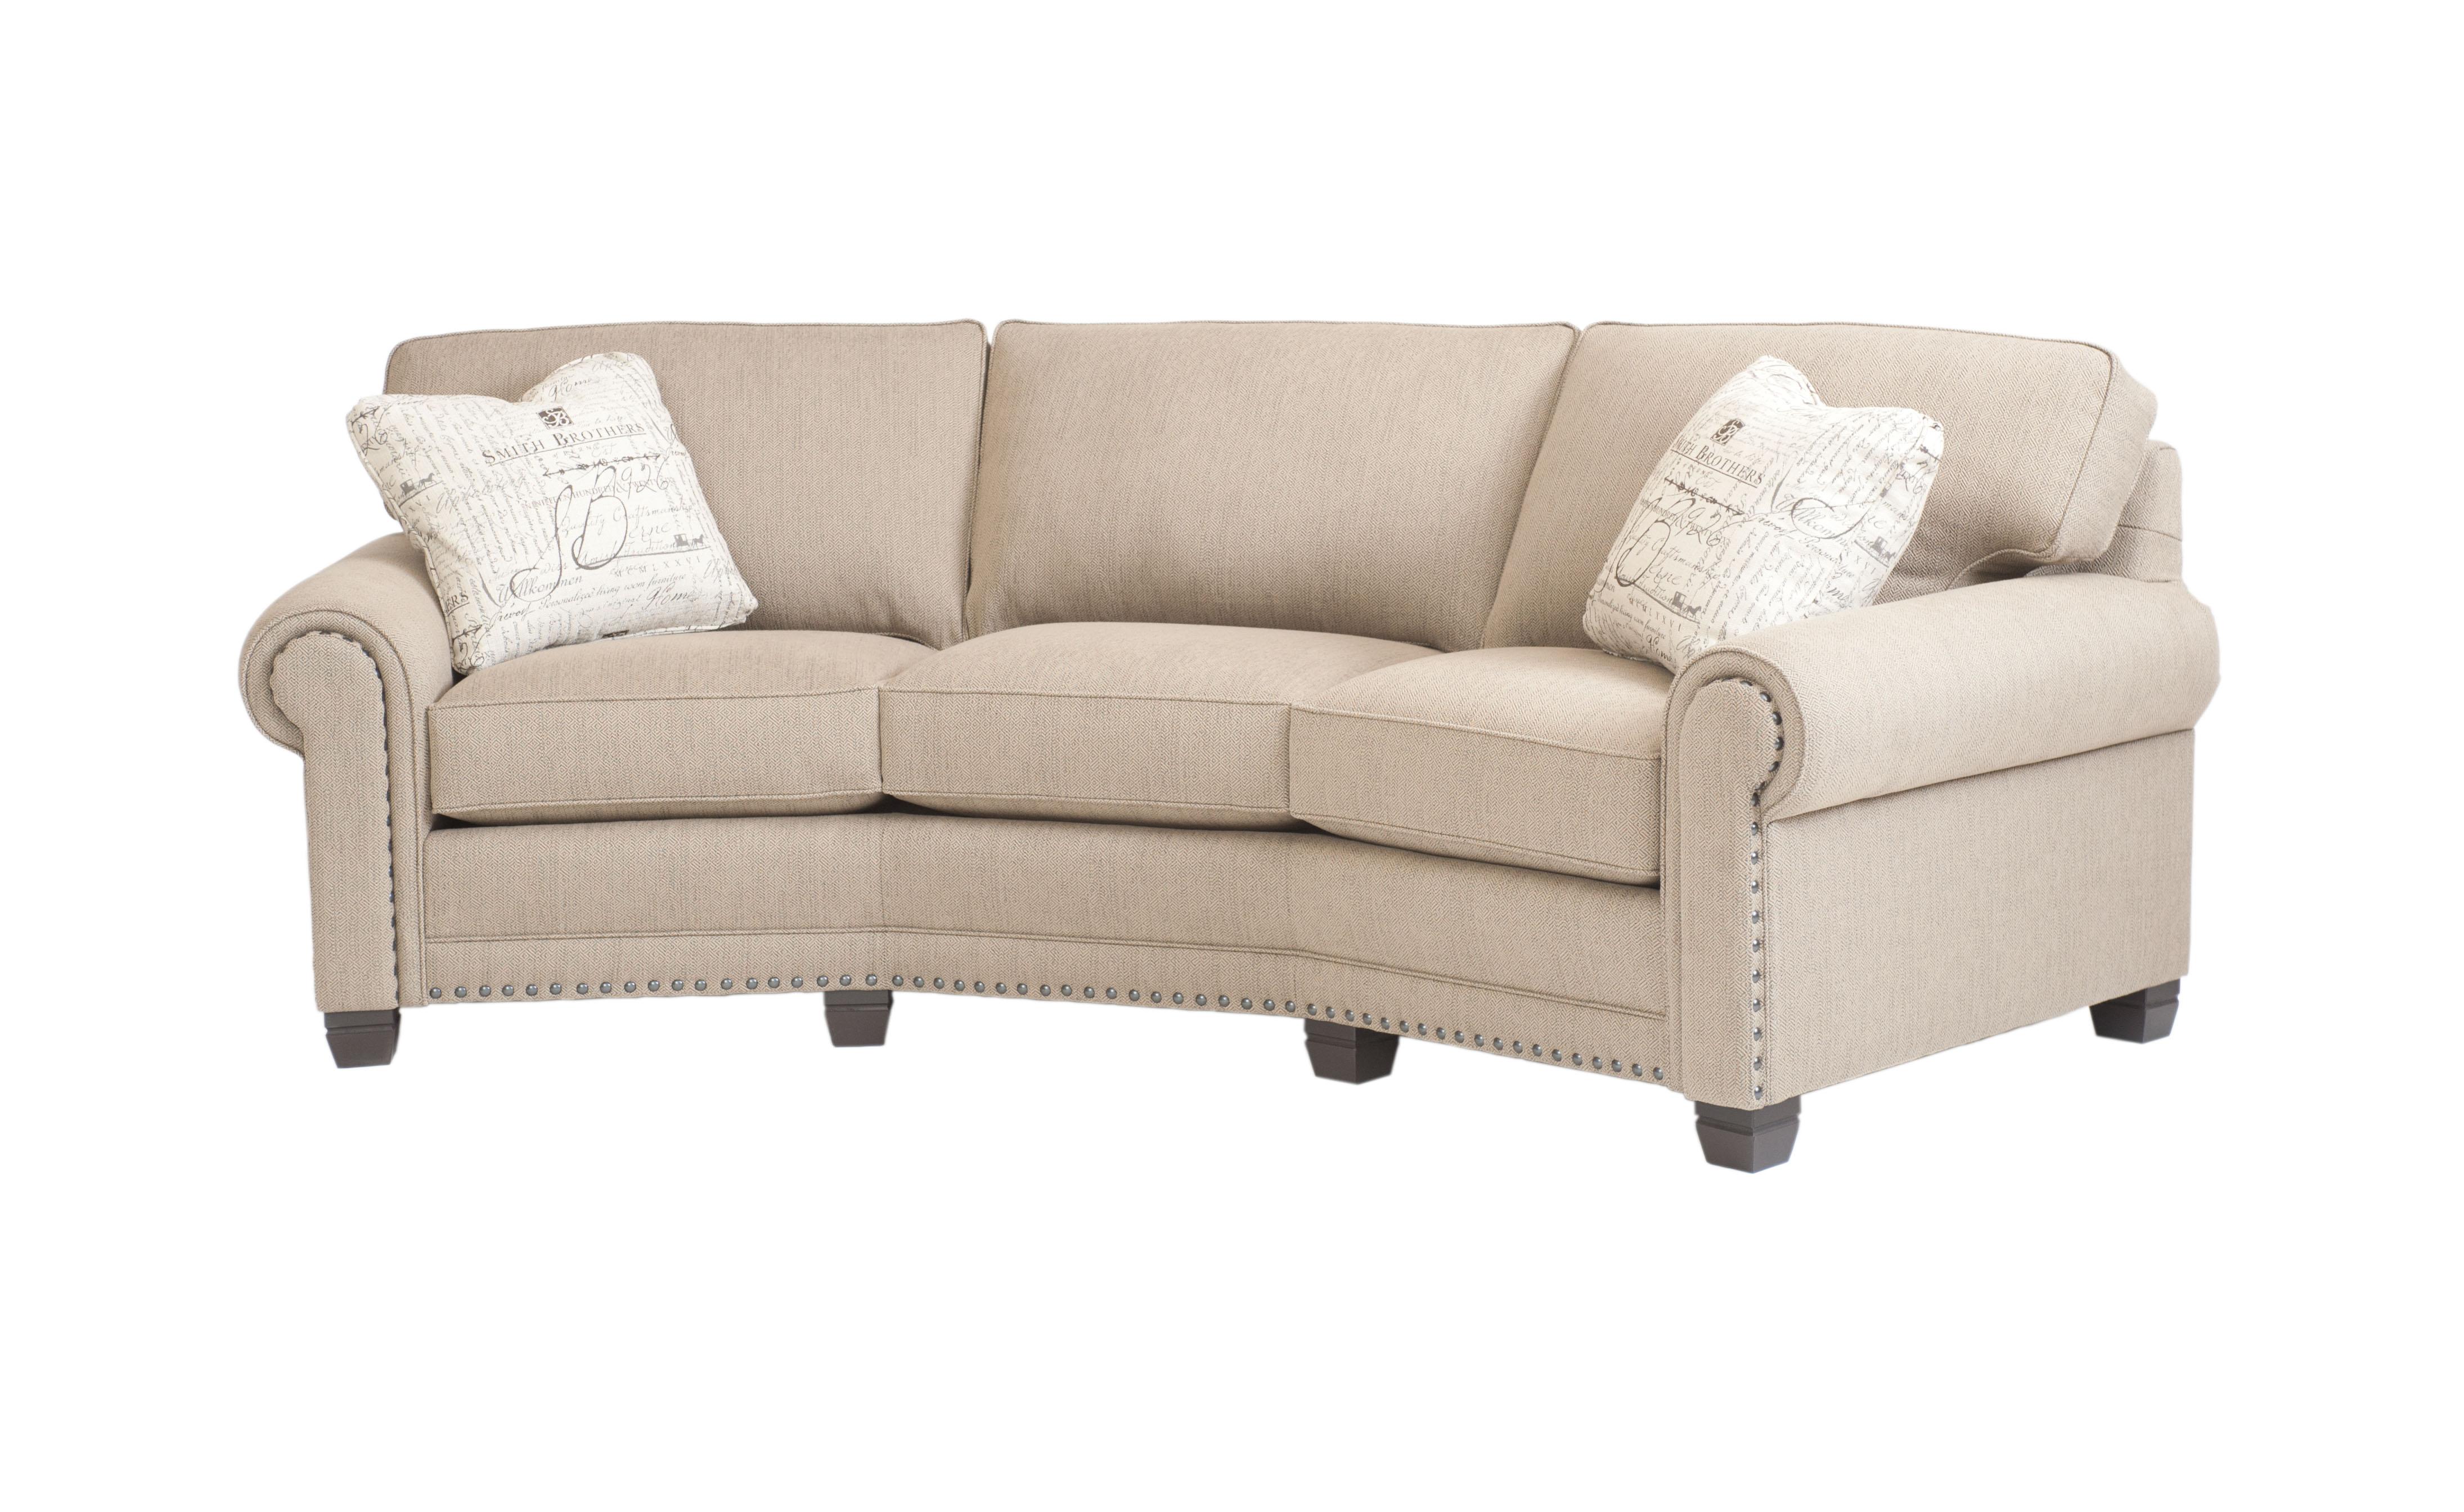 conversation sofas reviews cranberry leather sofa review saugerties furniture mart